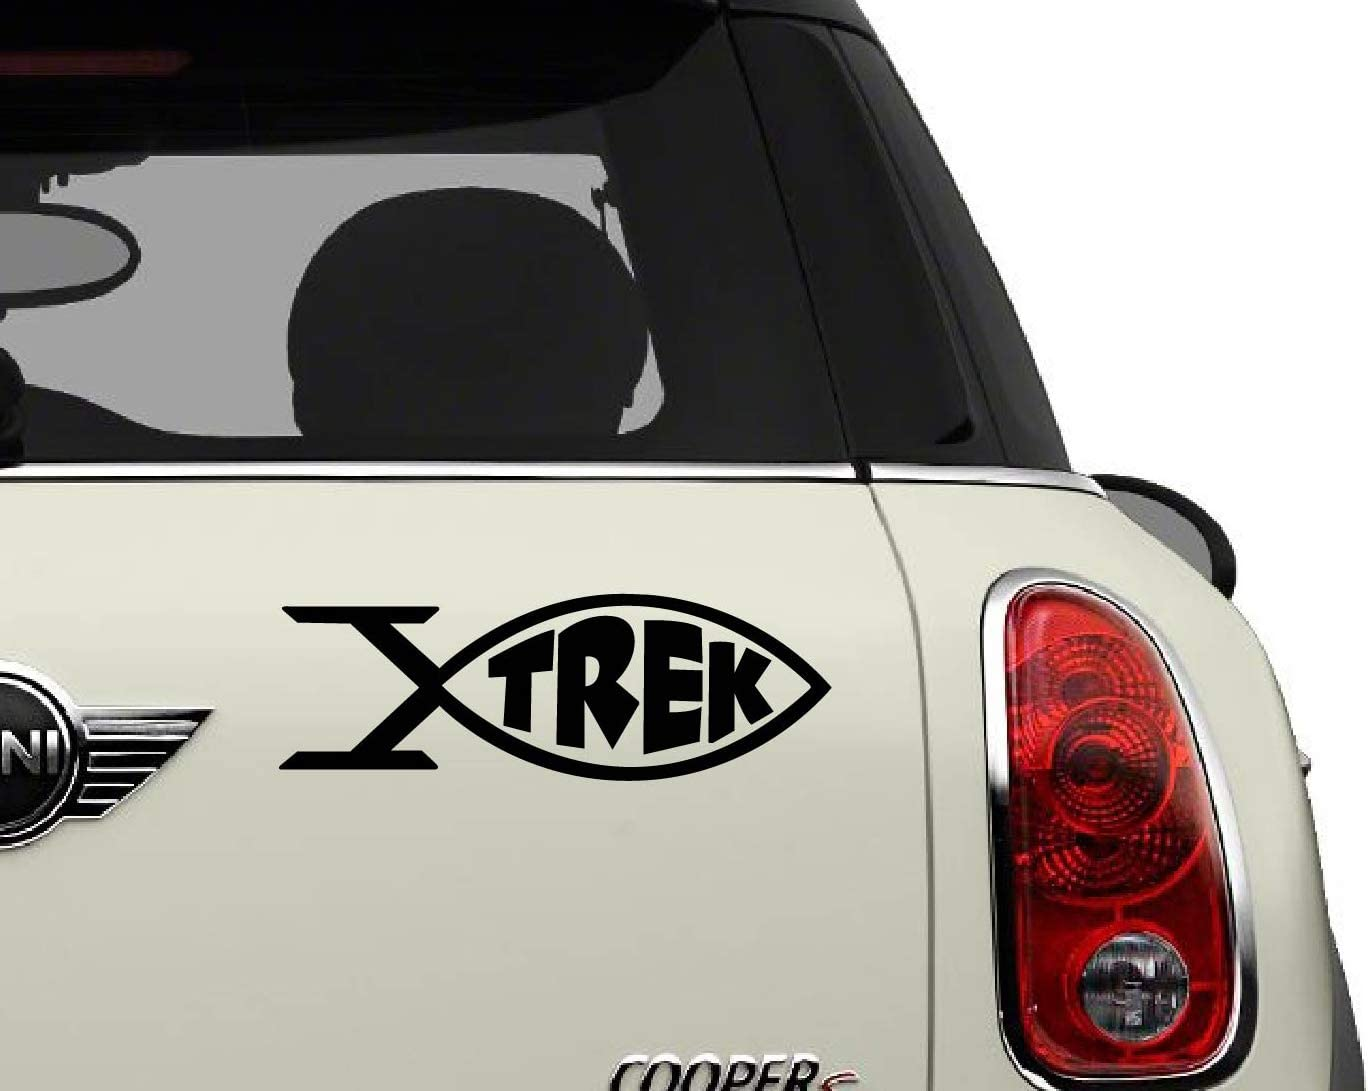 Star Trek Fish Black SCI-FI//Comics//Games Automotive Decal//Bumper Sticker